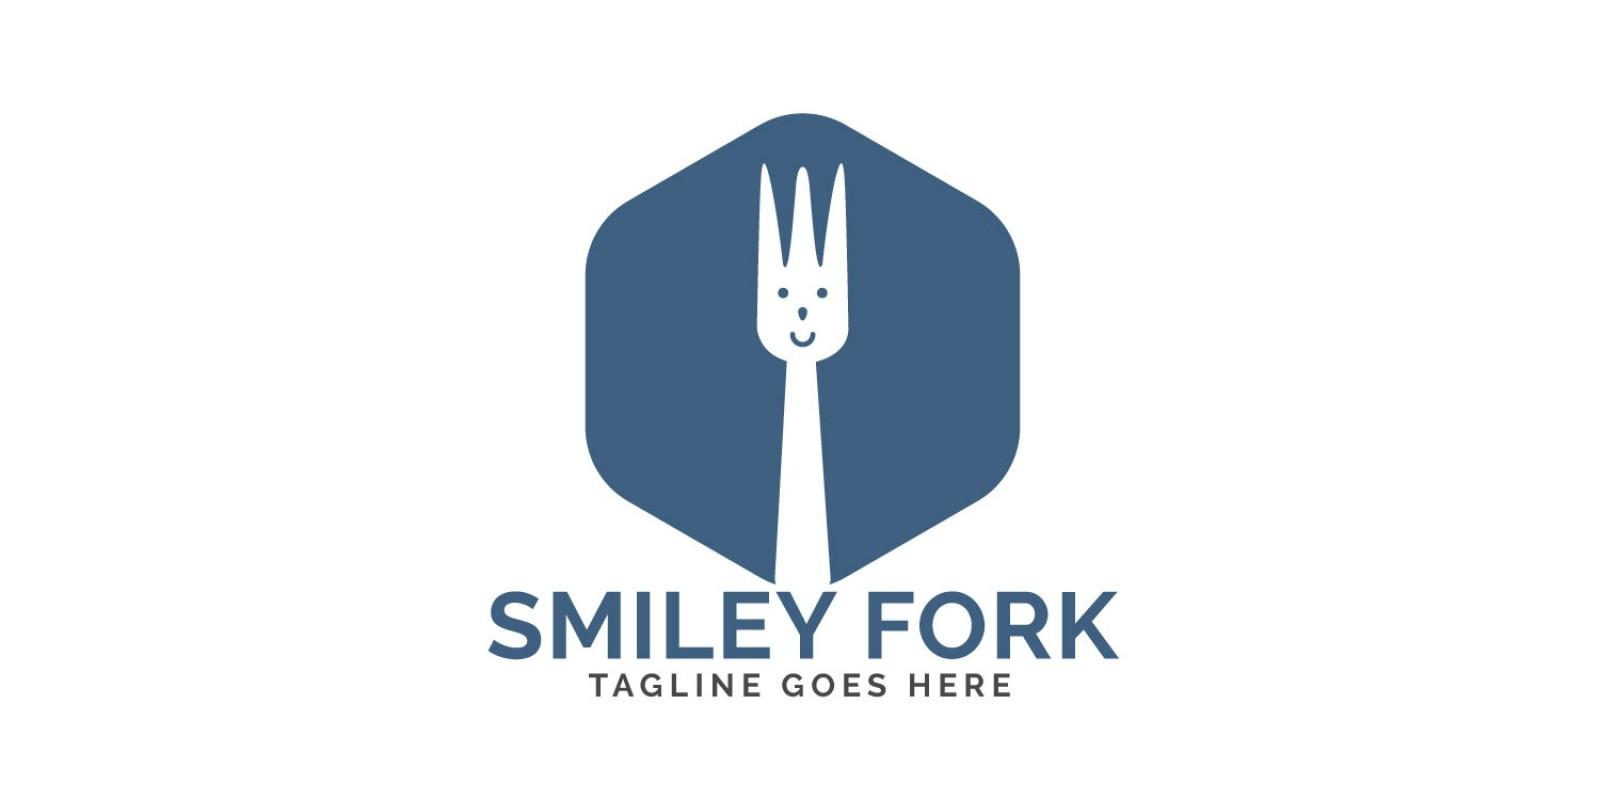 Smiley Fork Logo Design